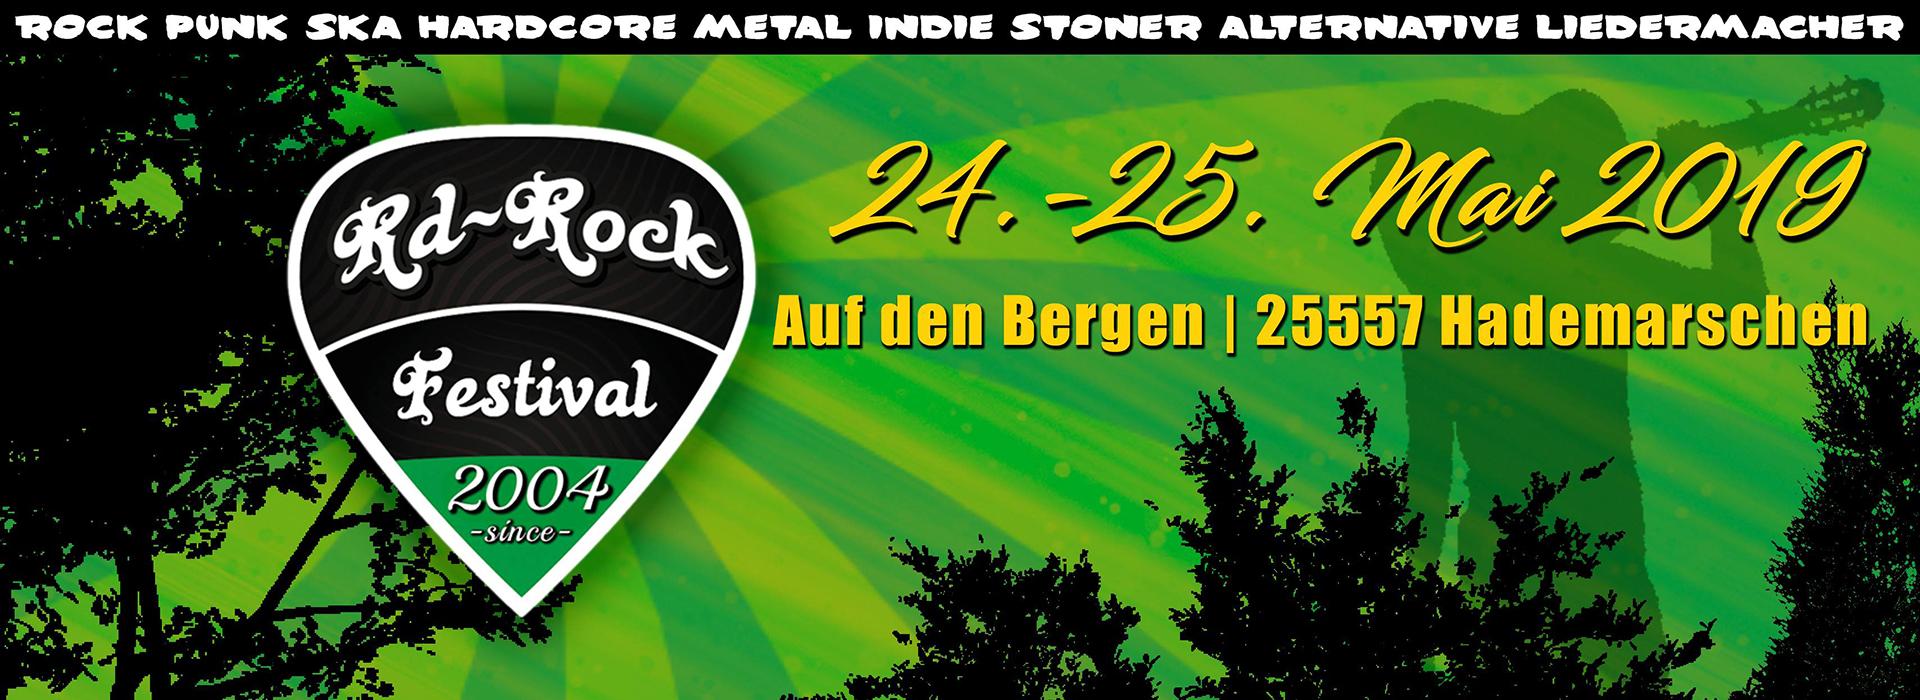 Line Up Rd Rock Festival